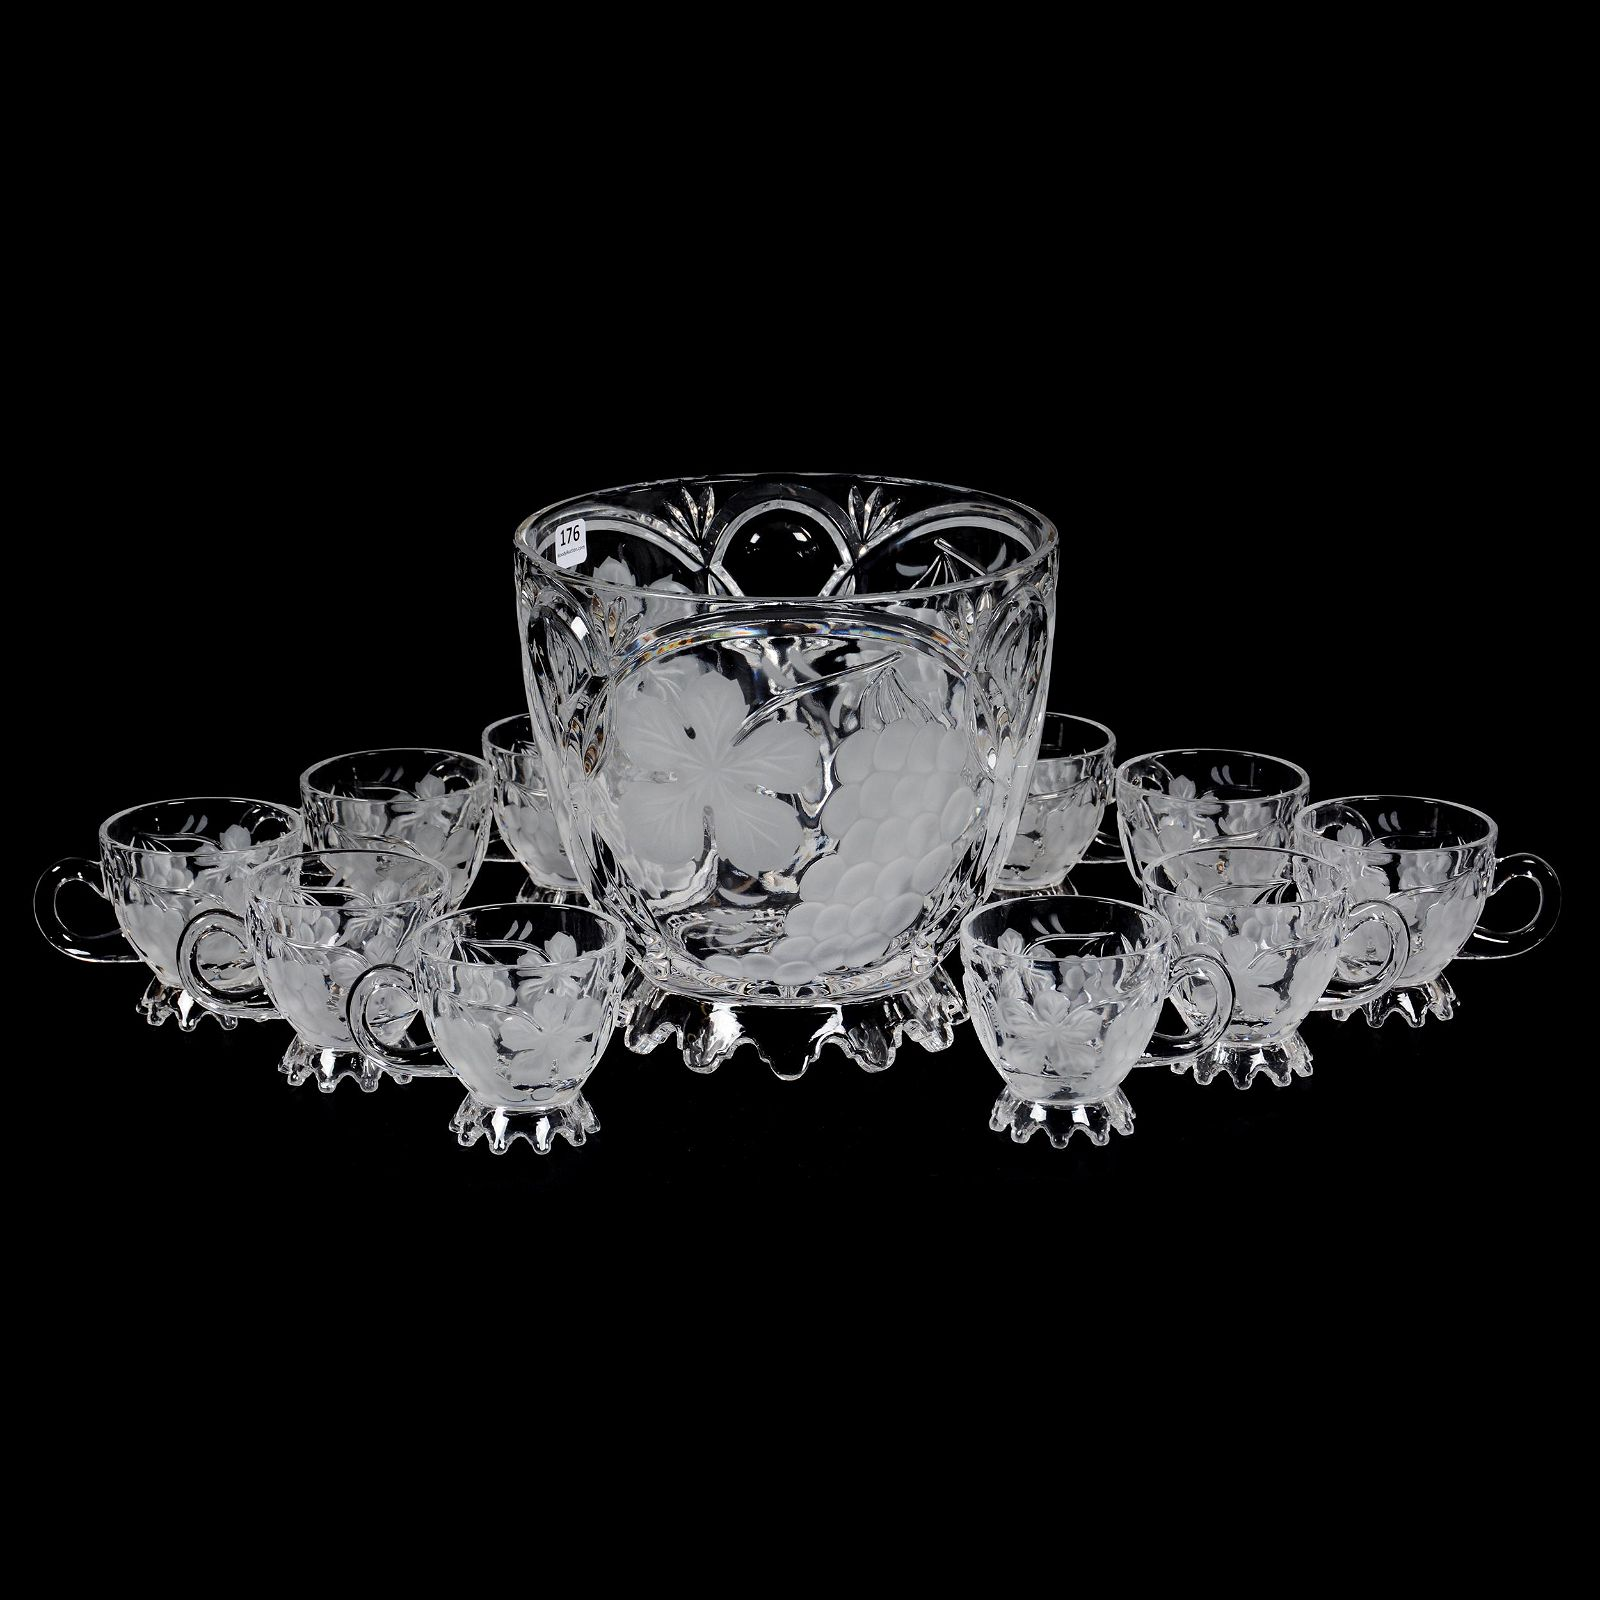 Punch Set, Modern Crystal